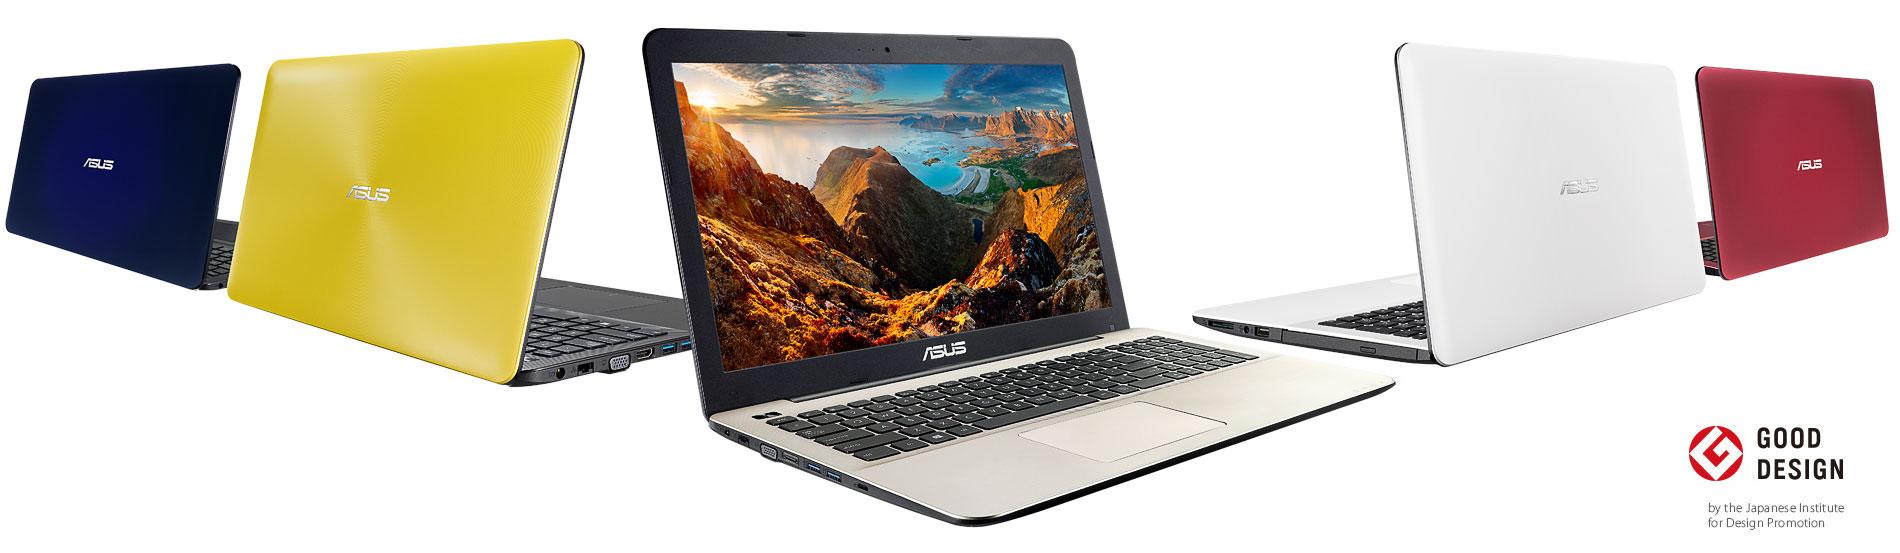 X555ln Laptops Asus Global Computer Hard Drive Circuit Board Notebook Zazzle